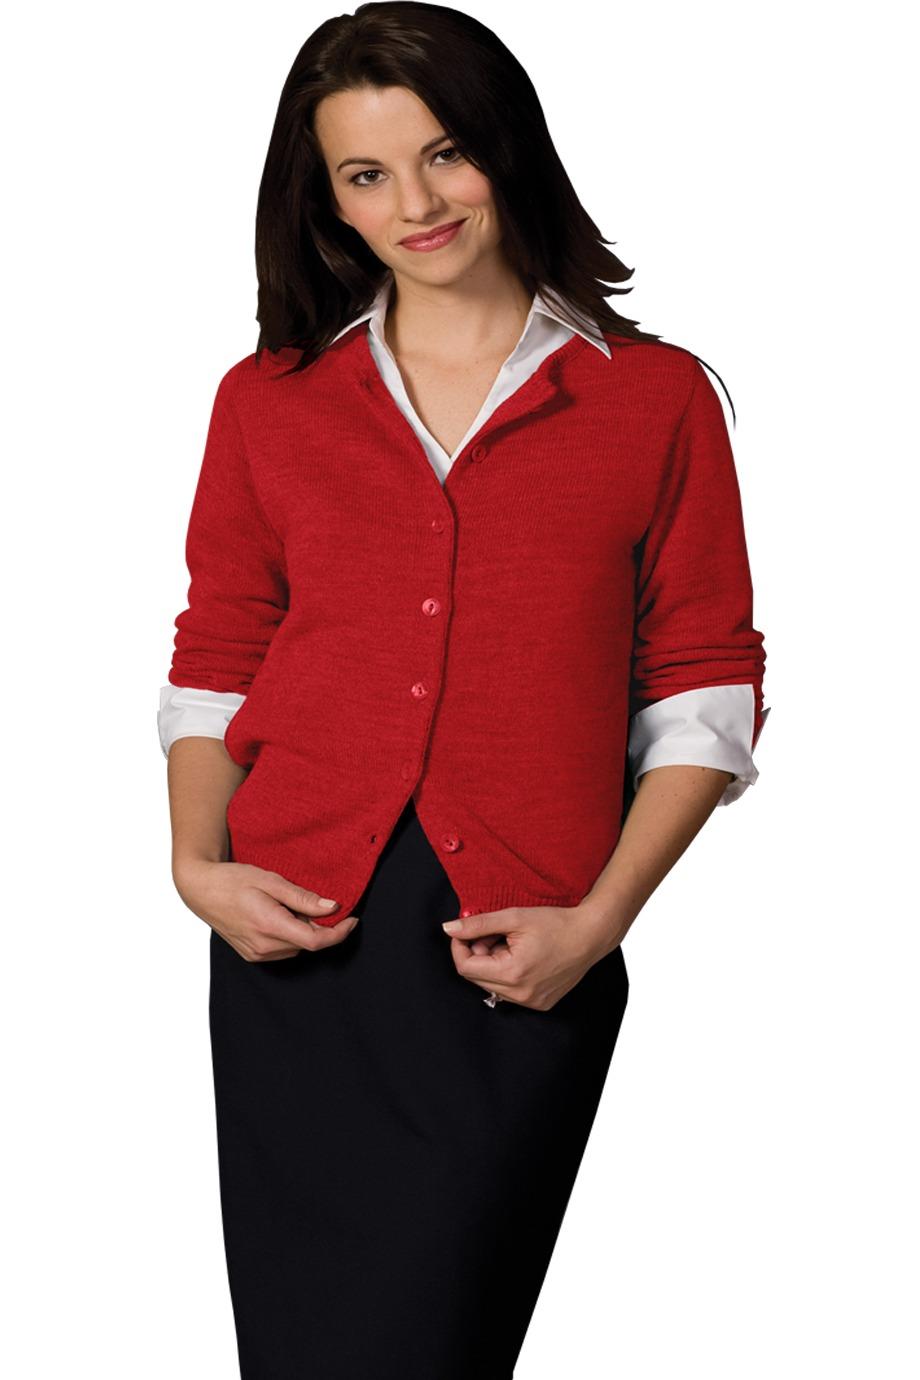 Edwards Garment 220 女士圆领开襟羊毛衫